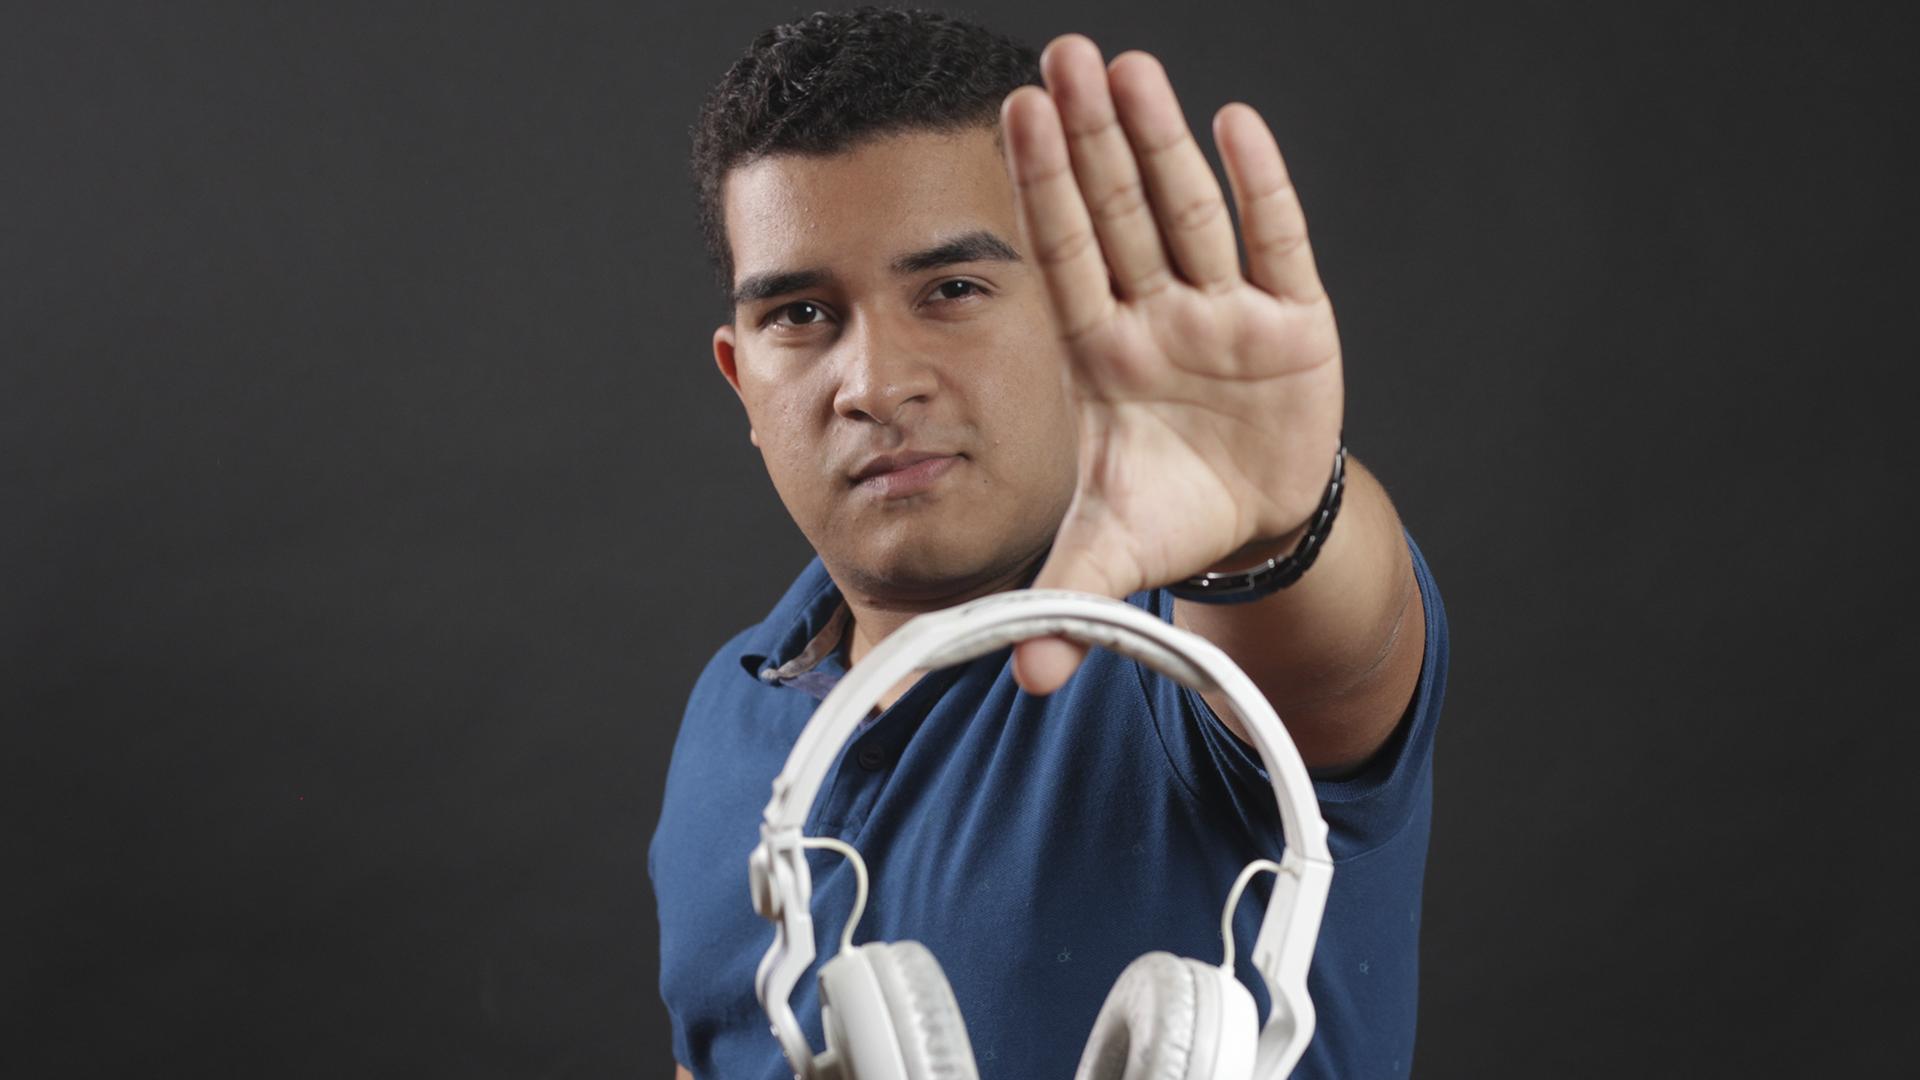 DJ RAMS